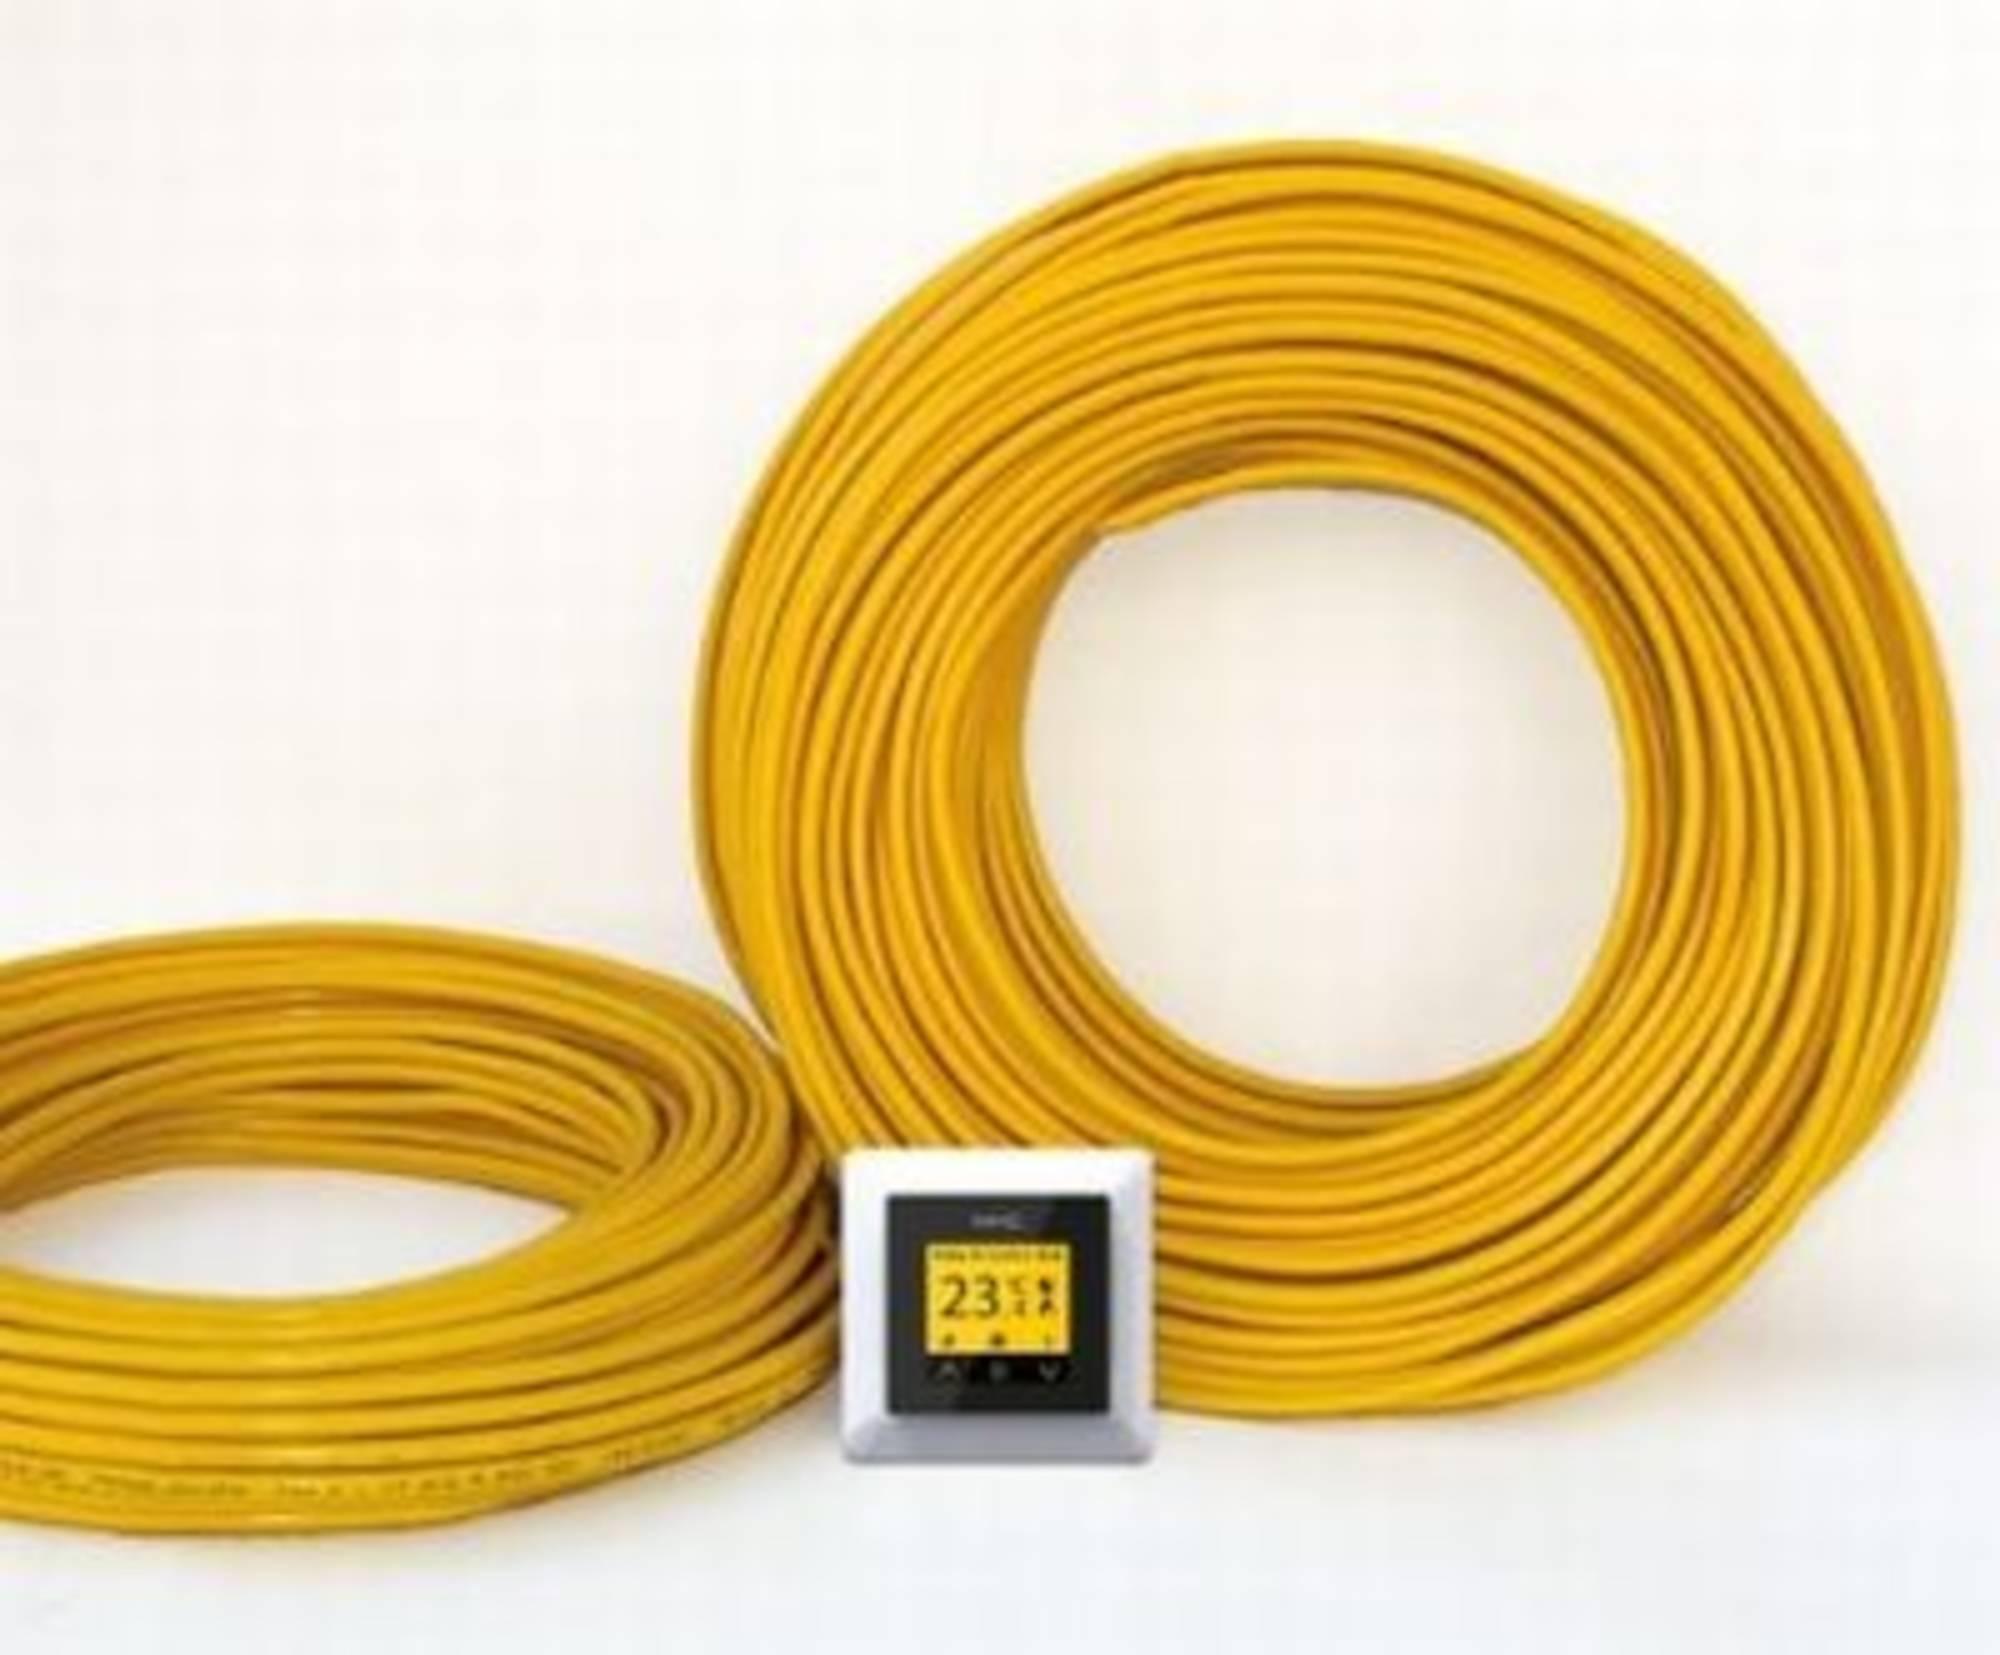 Magnum X-treme control cable verwarmingsset 2900w 170,6 m.